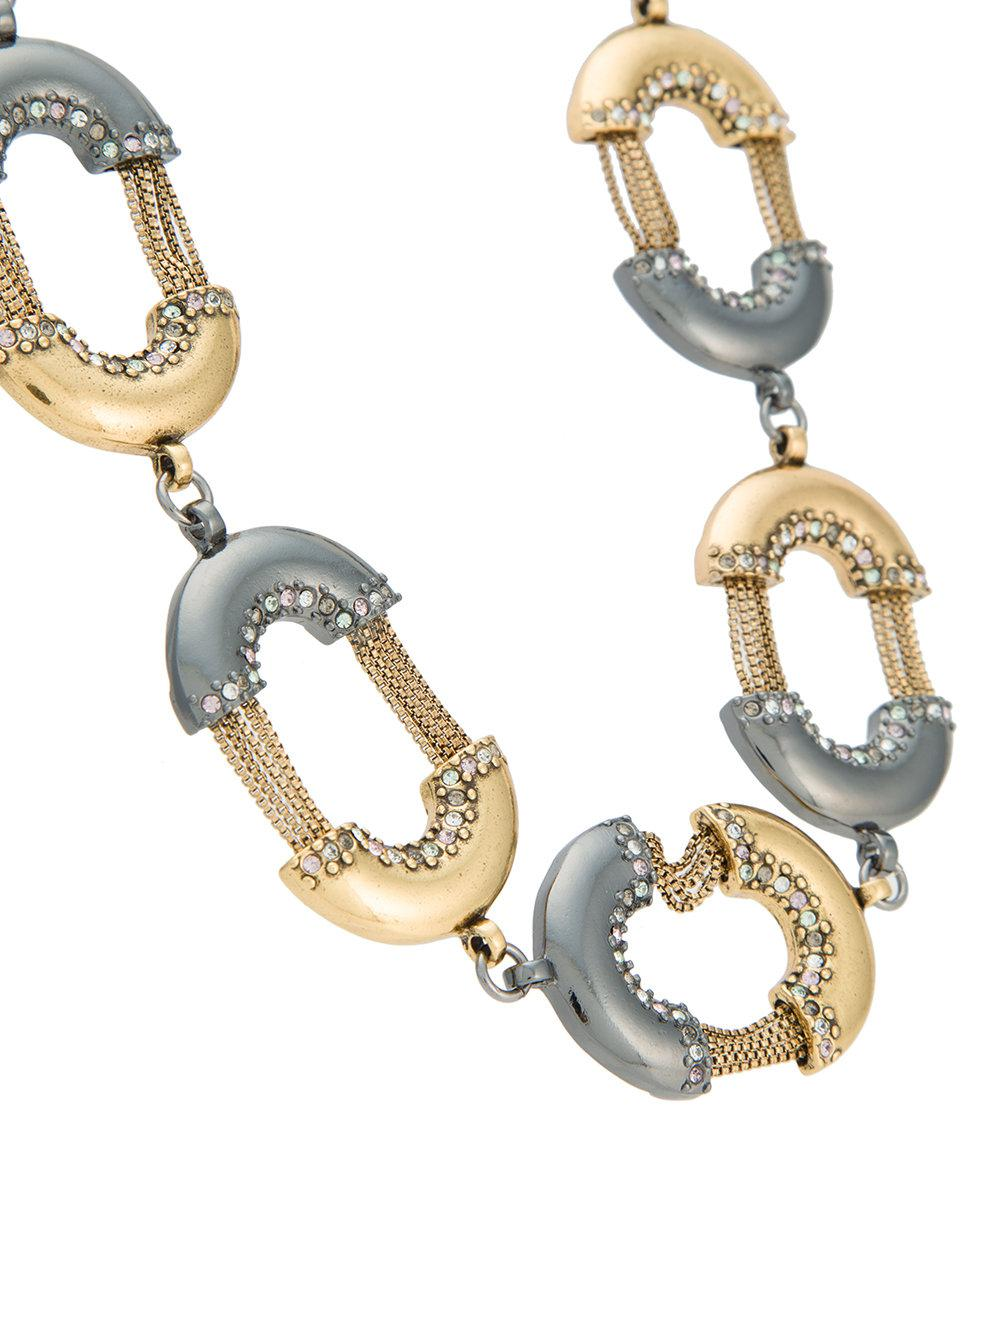 Camila Klein Bicolour Links Necklace in Metallic